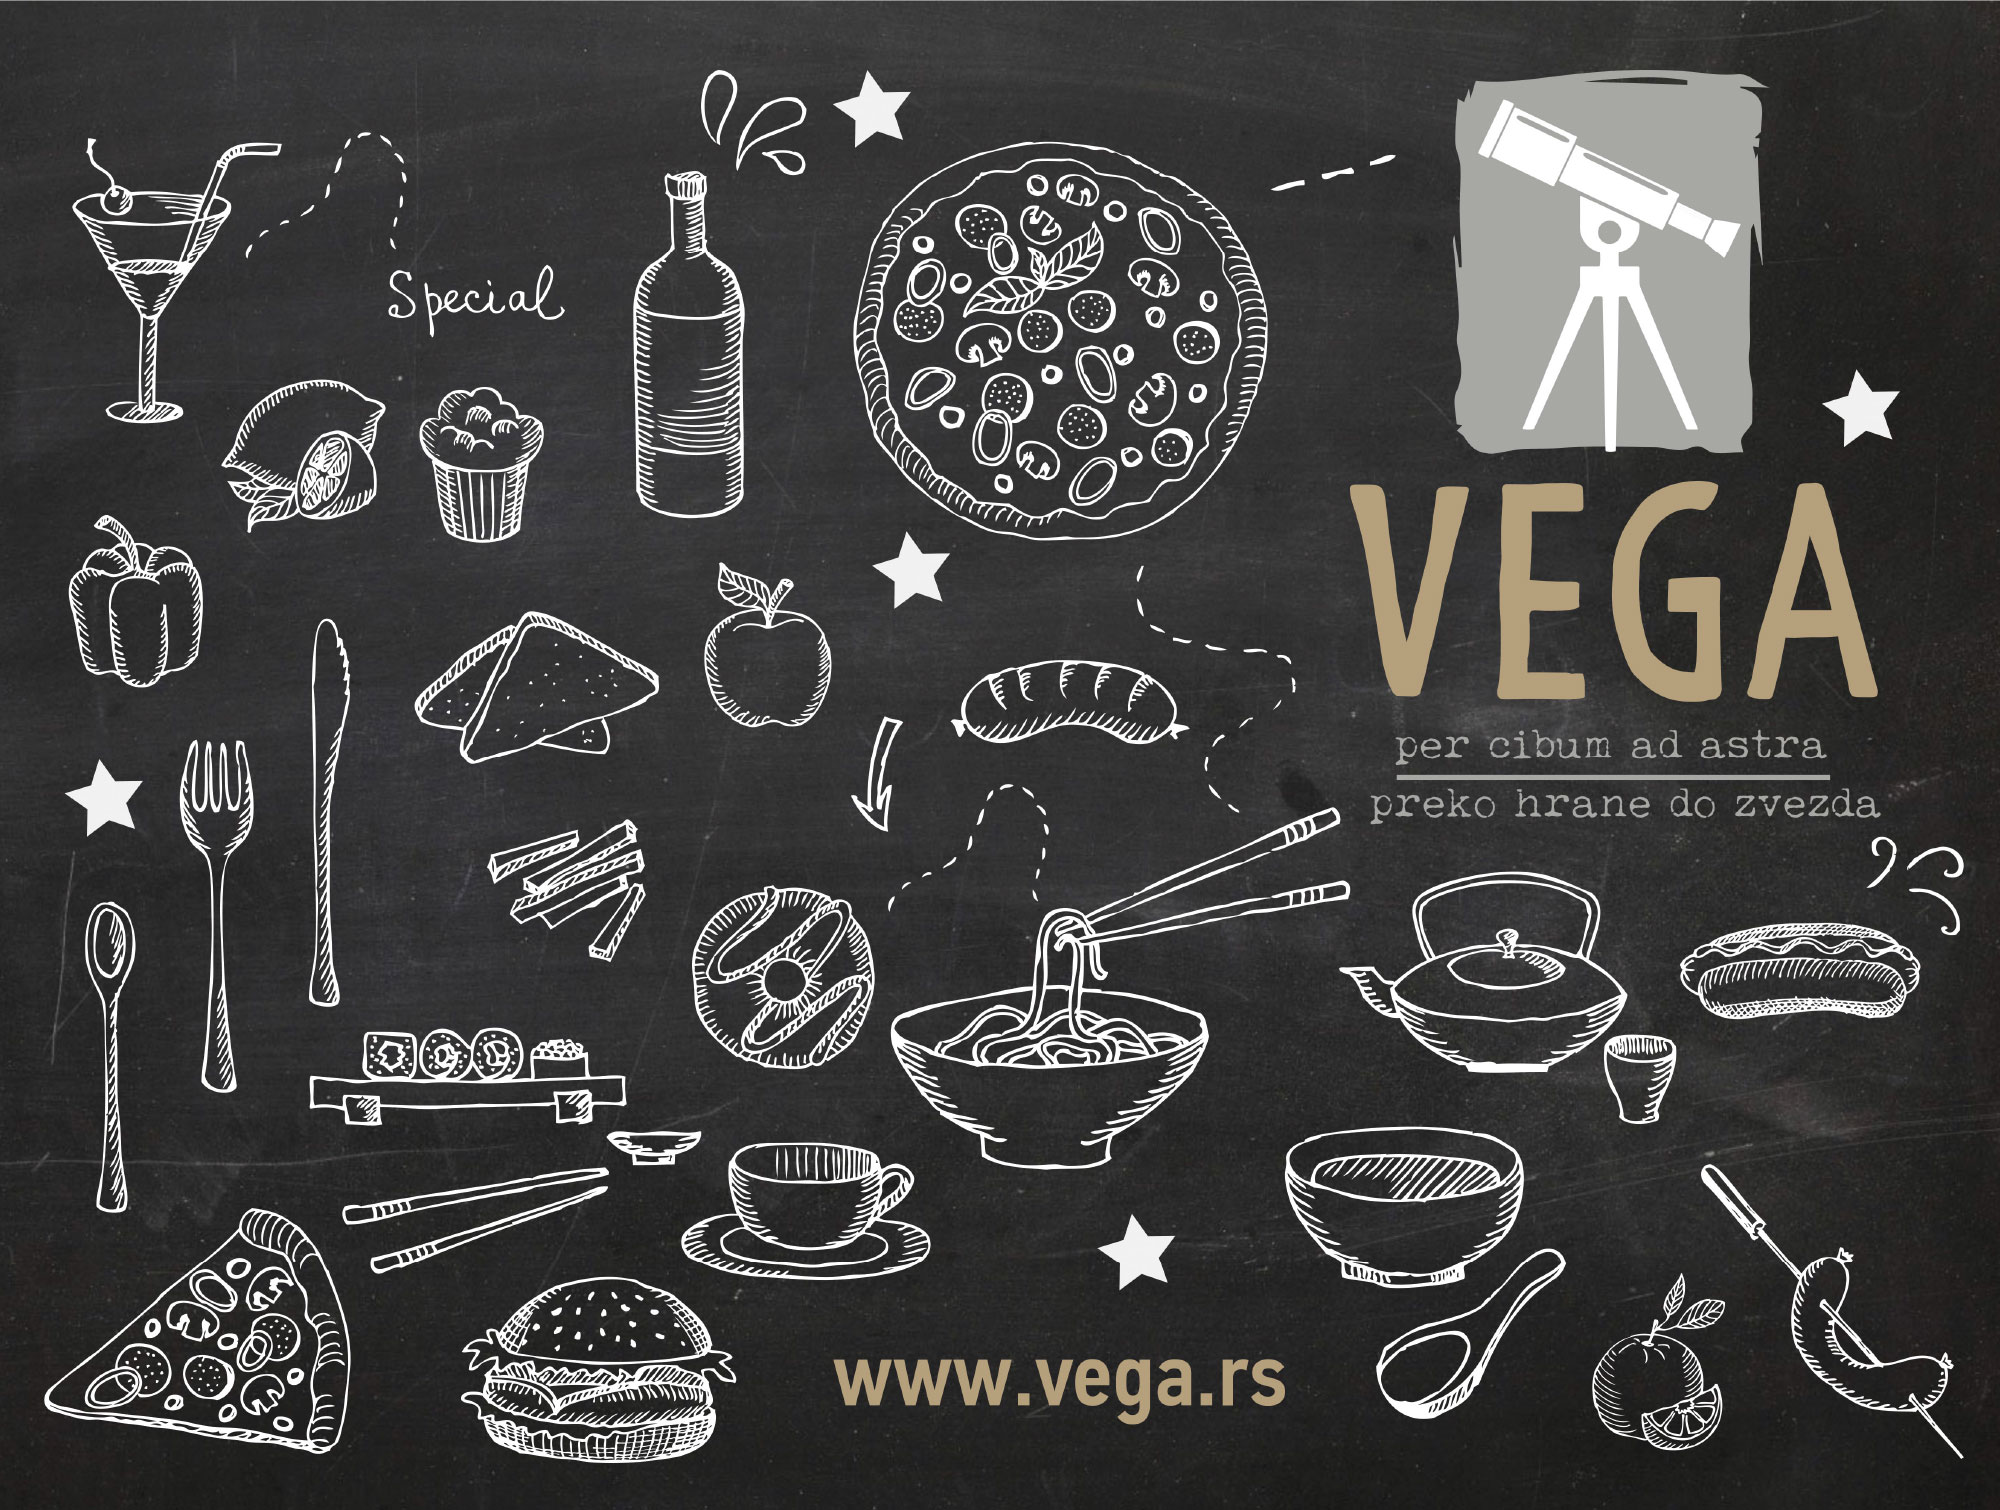 vega poster 4